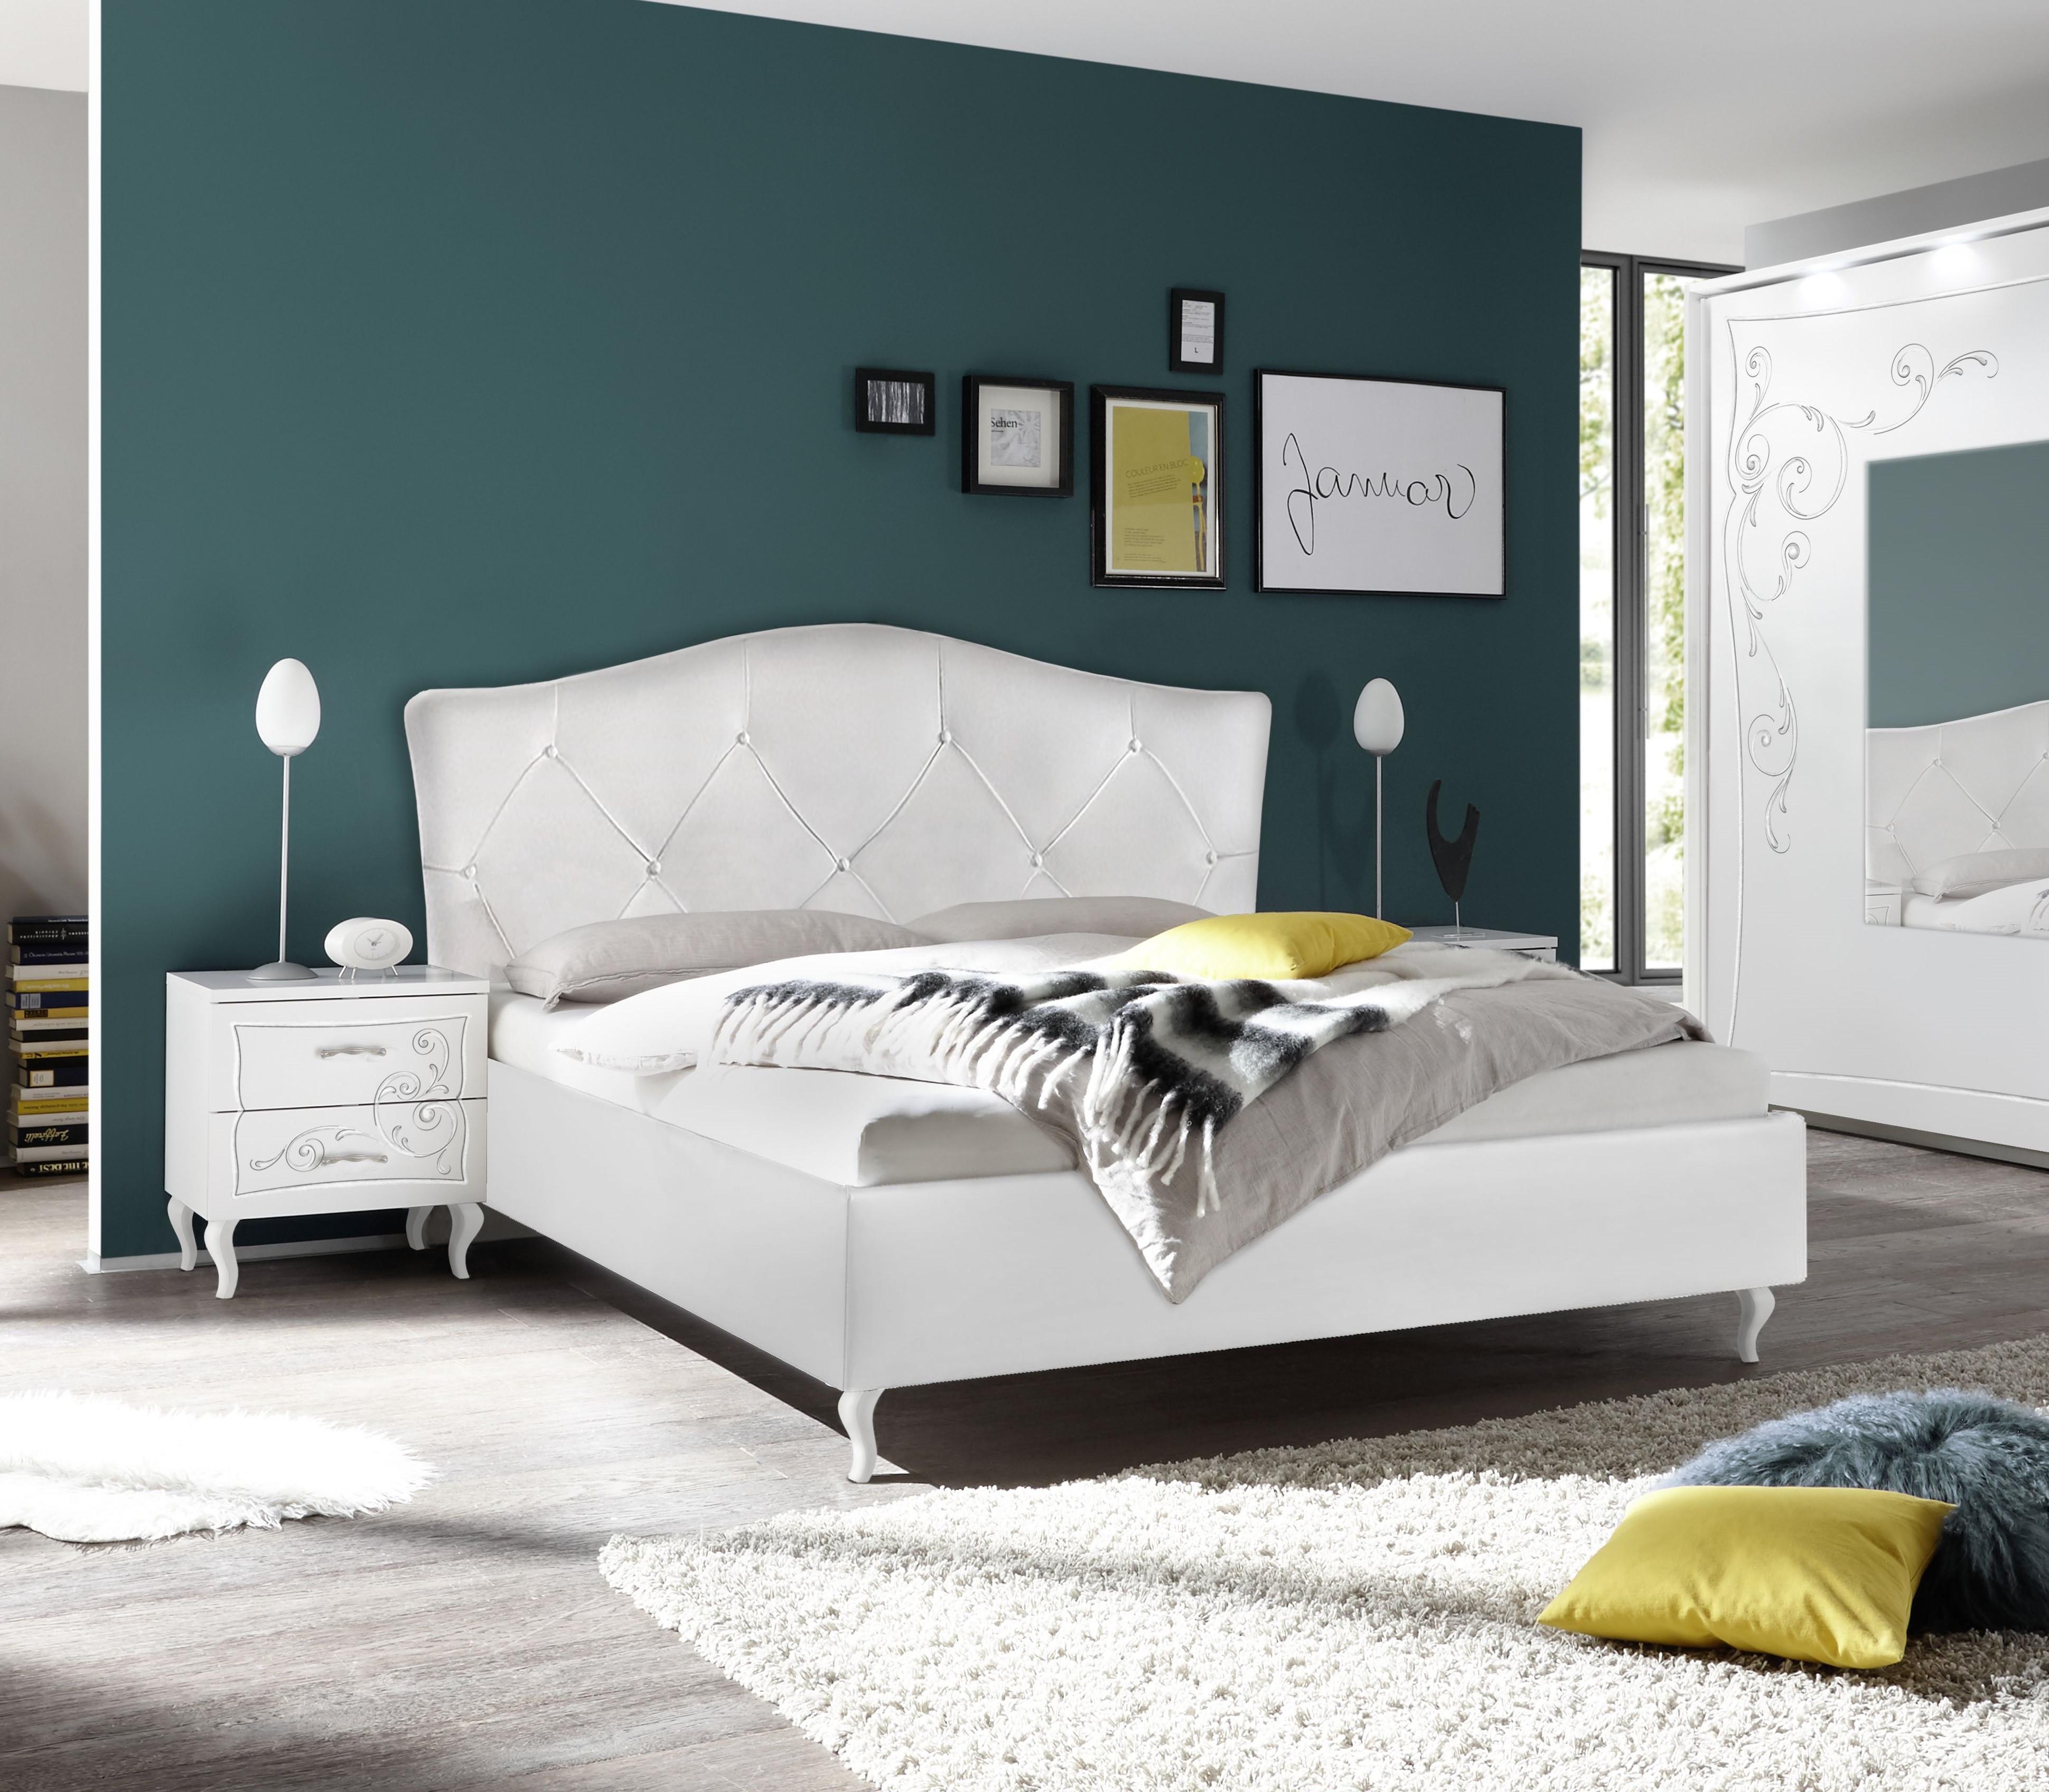 Gioia Modern Upholstered Italian Bed With Storage 3788 Sena Home Furniture